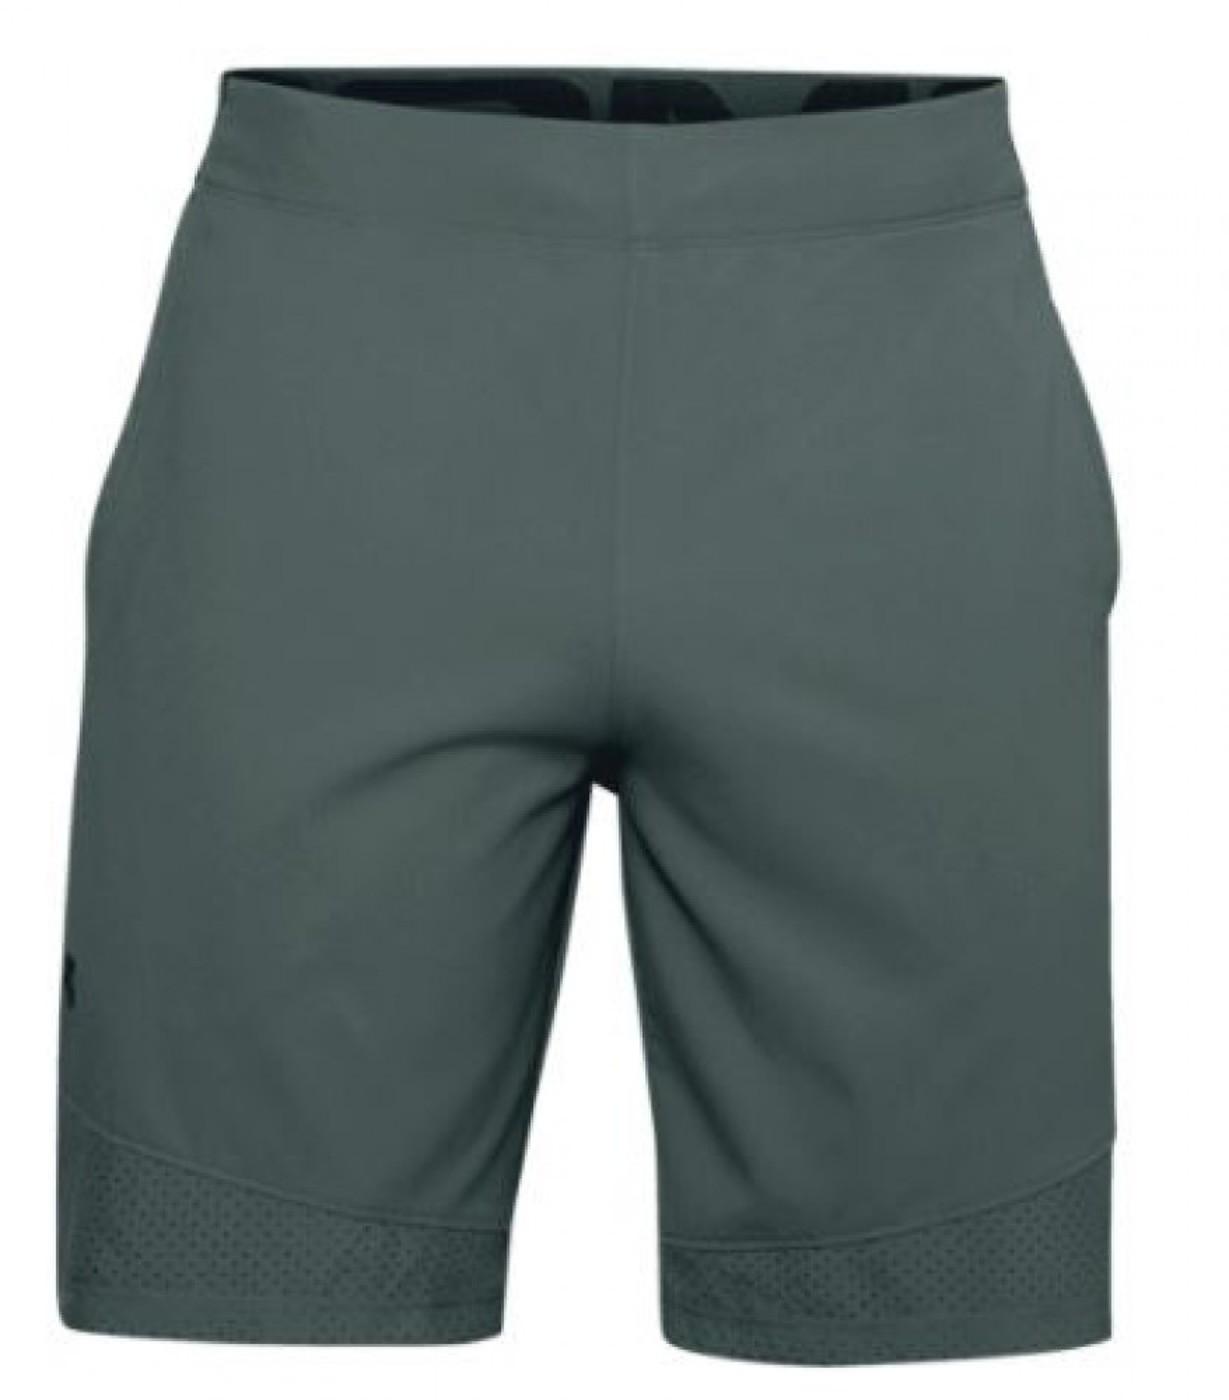 UNDER ARMOUR UA Vanish Woven Shorts - Herren